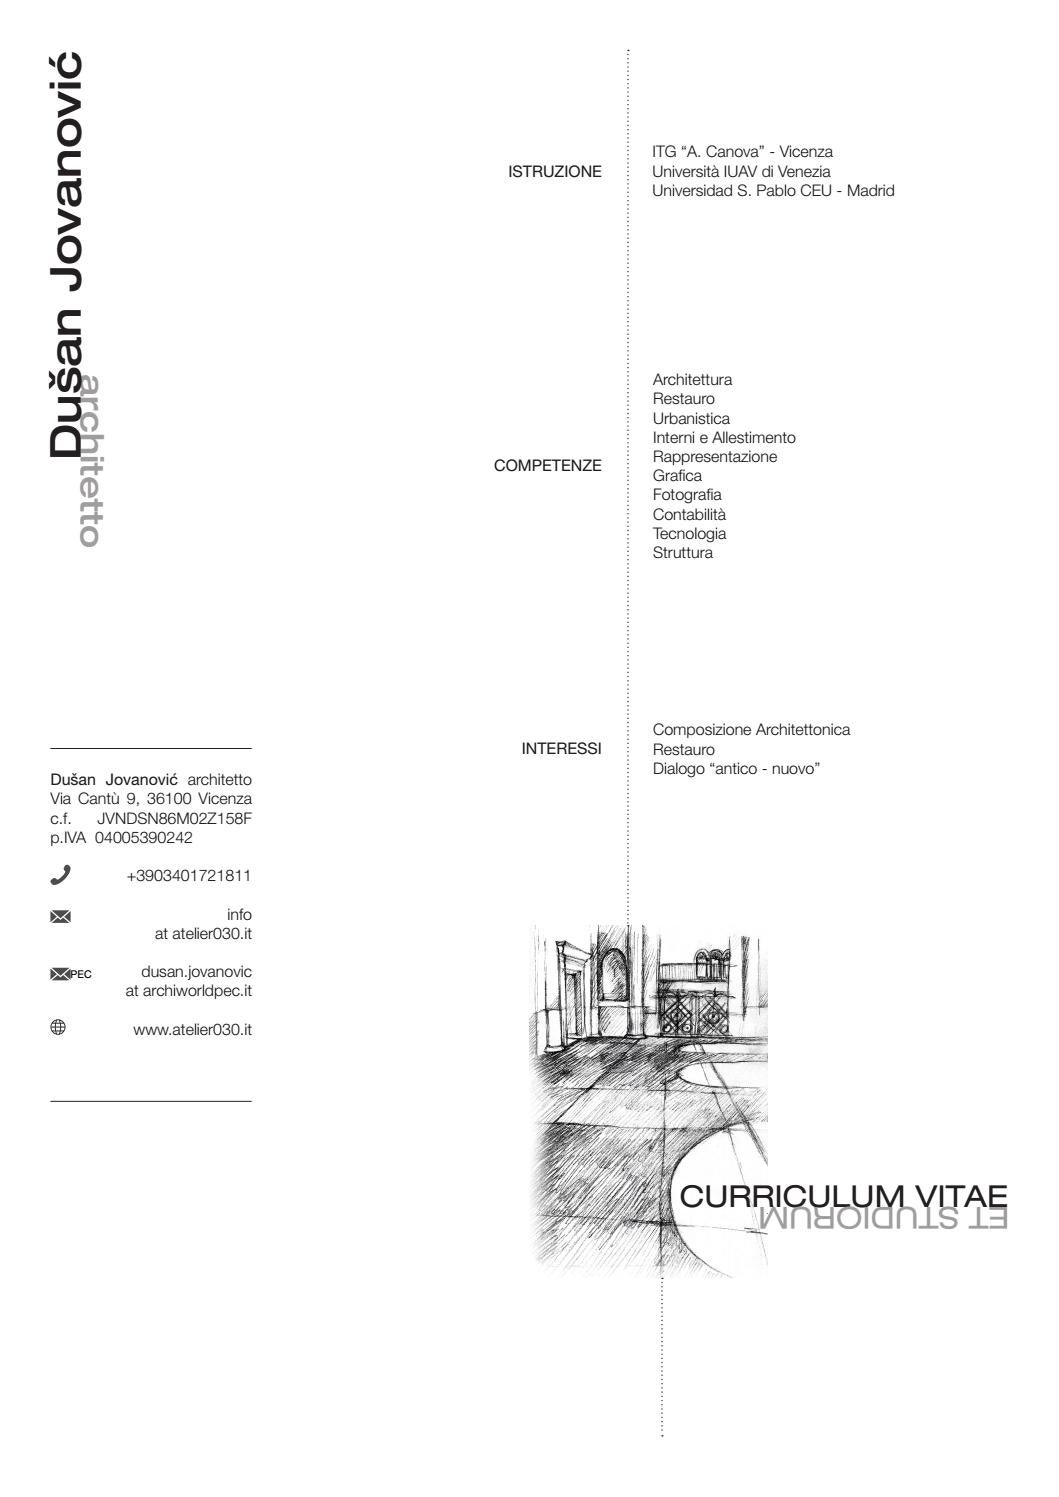 Dusan Jovanovic Architetto Curriculum Vitae By Dušan Jovanović Issuu